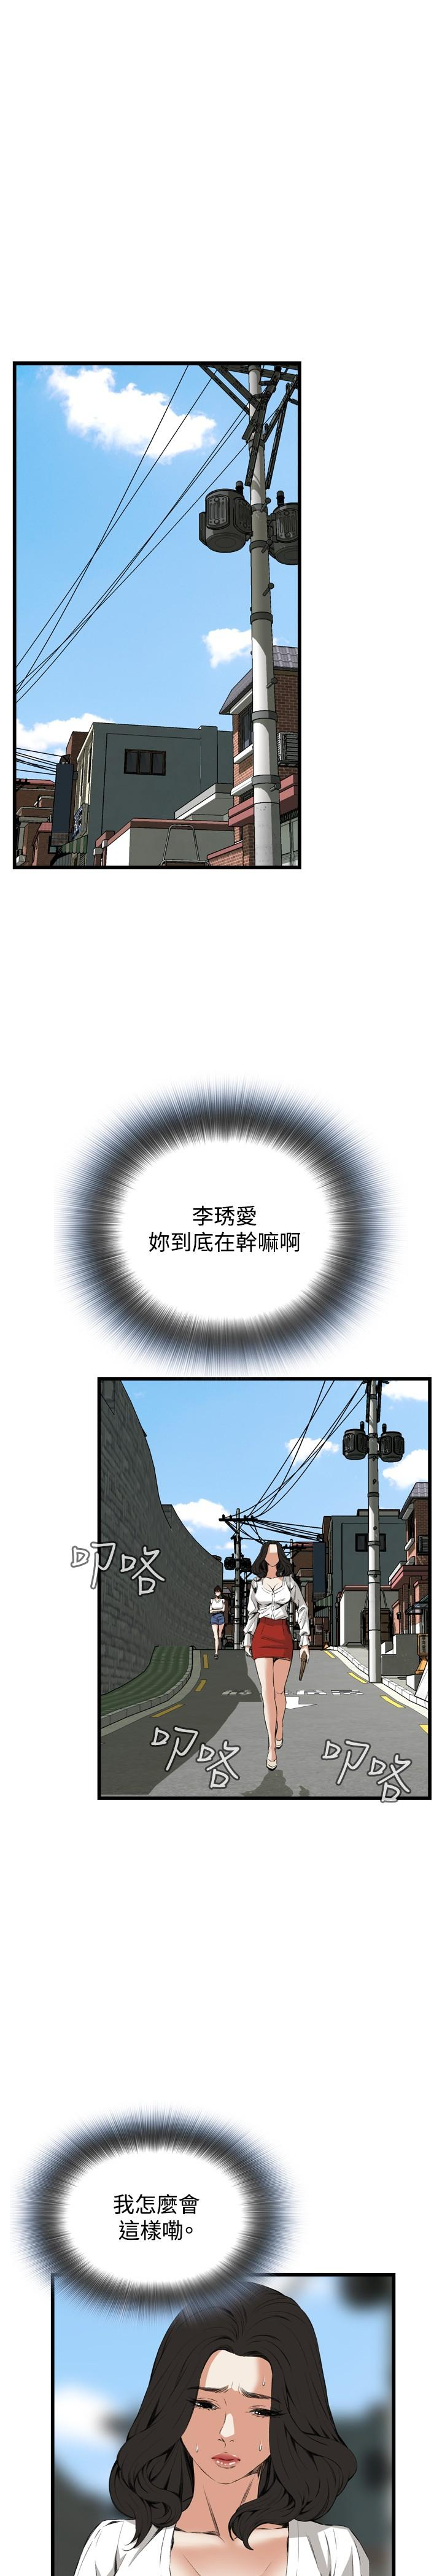 Take a Peek 偷窥 Ch.39~60 [Chinese]中文 409